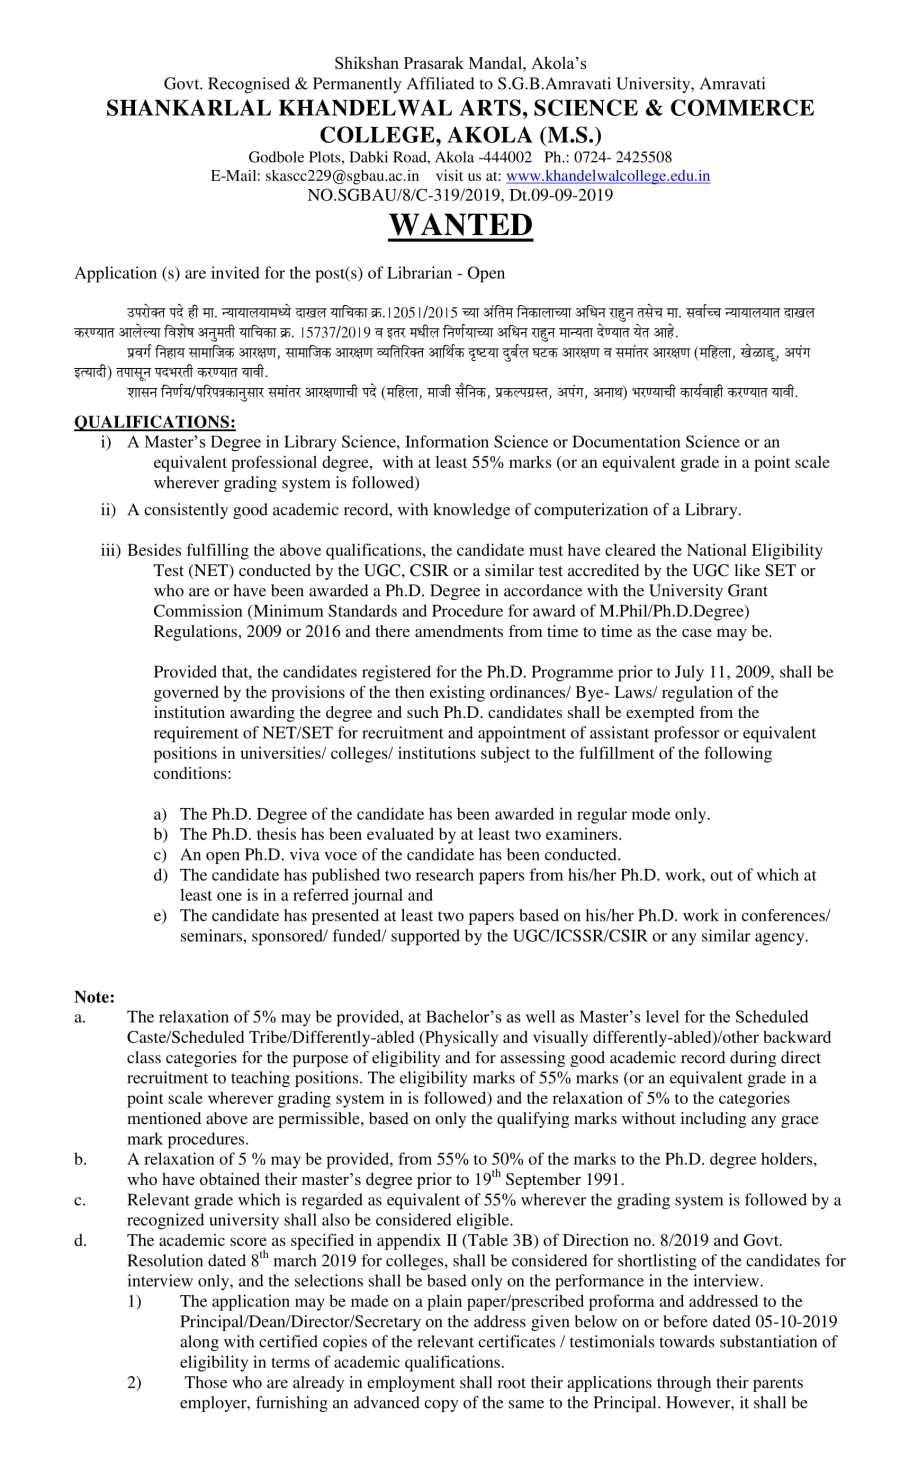 Advt of teachers with Specialization-1.jpg